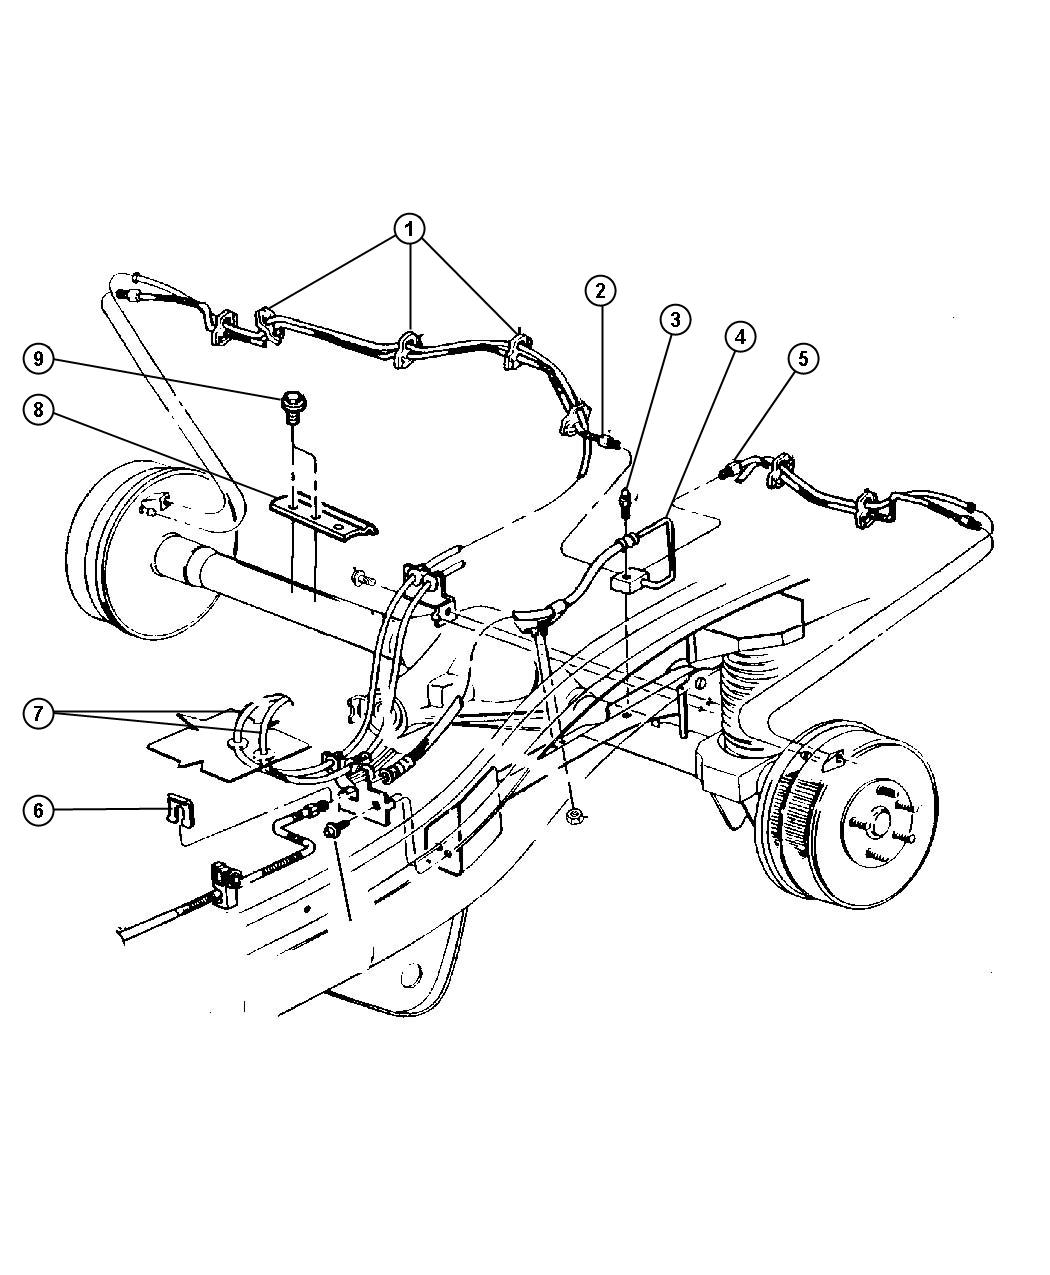 dodge grand caravan wiring diagram connectors pinouts